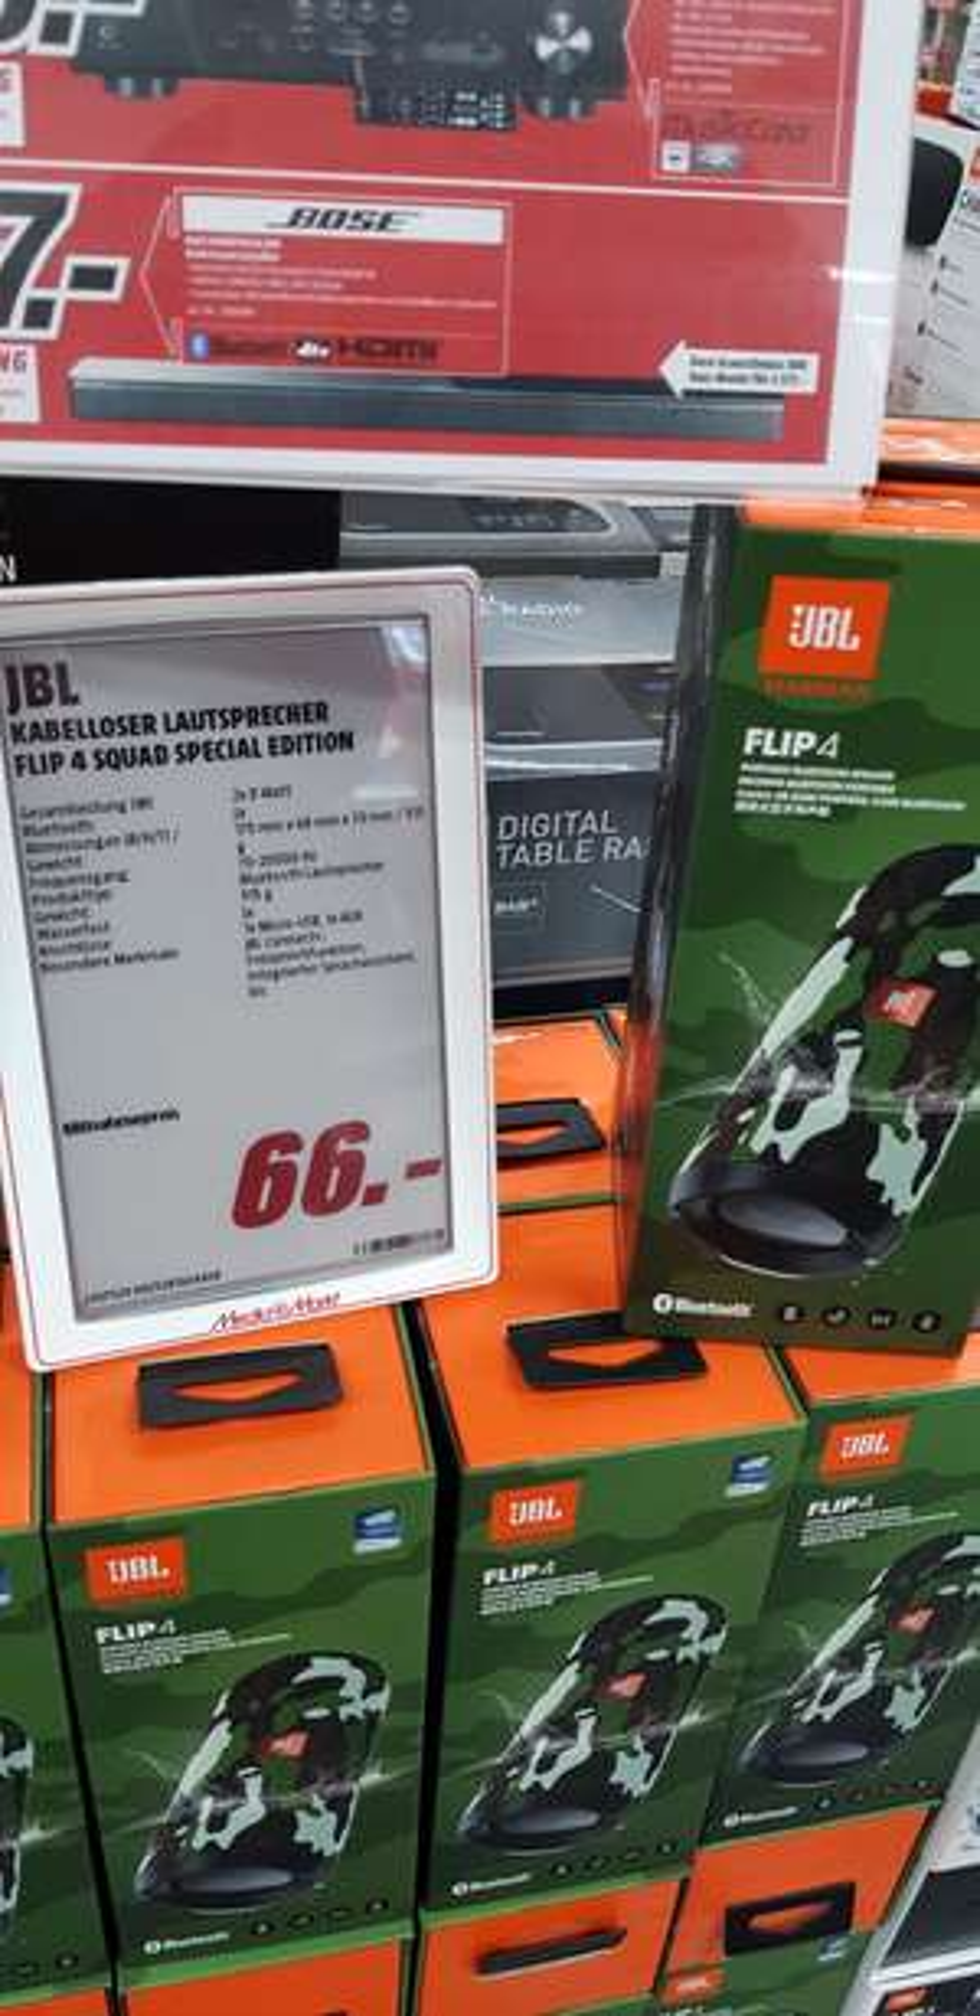 [Lokal Media Markt Osnabrück-Belm] JBL Flip 4 Squad Special Edition Kabelloser Lautsprecher